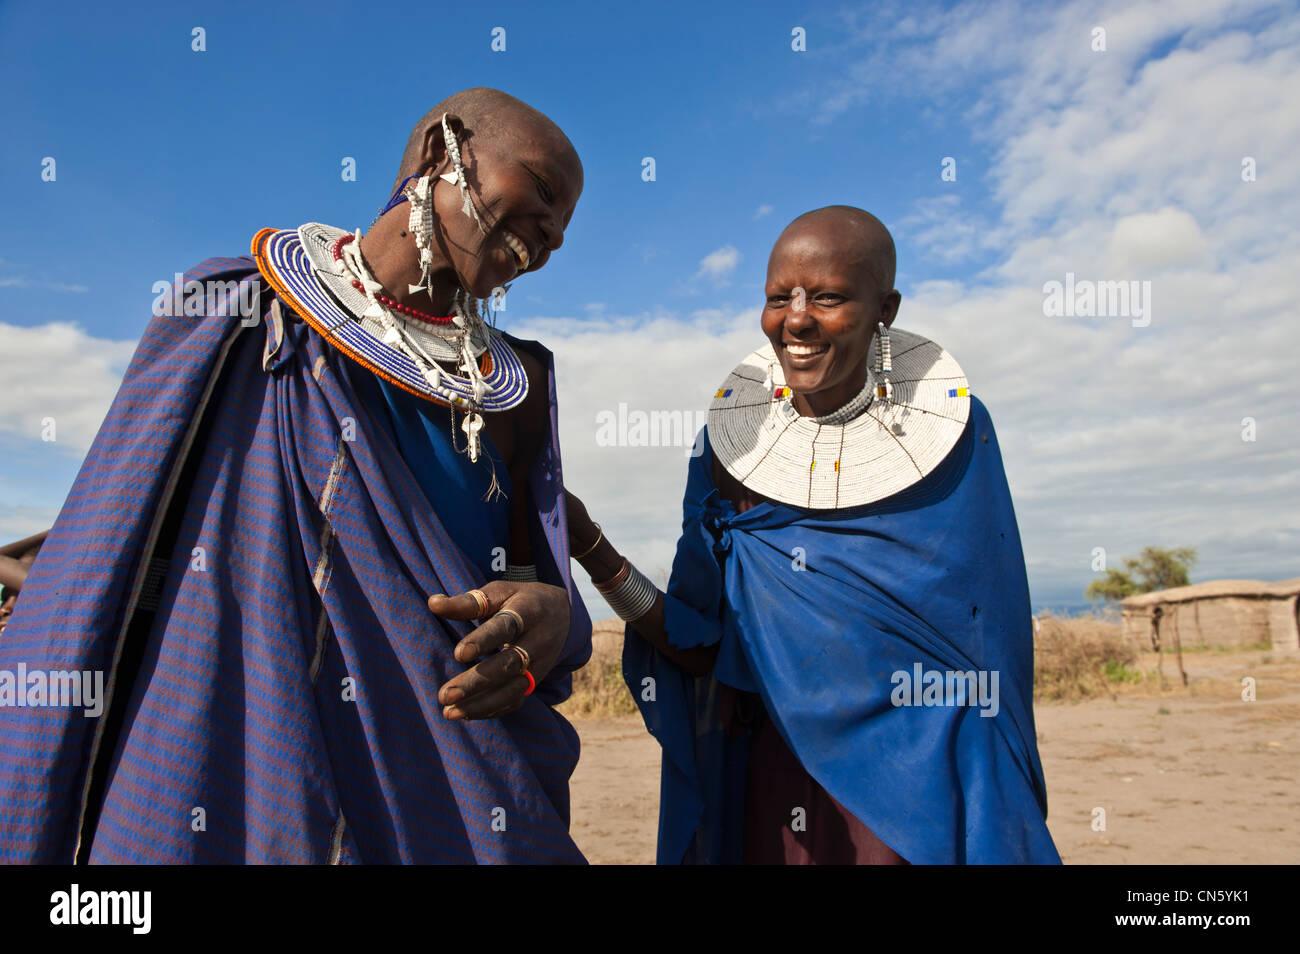 Tanzania, Arusha region, Rift Valley, some of the Manyara National Park, Masai village around Mto Wa Mbu - Stock Image